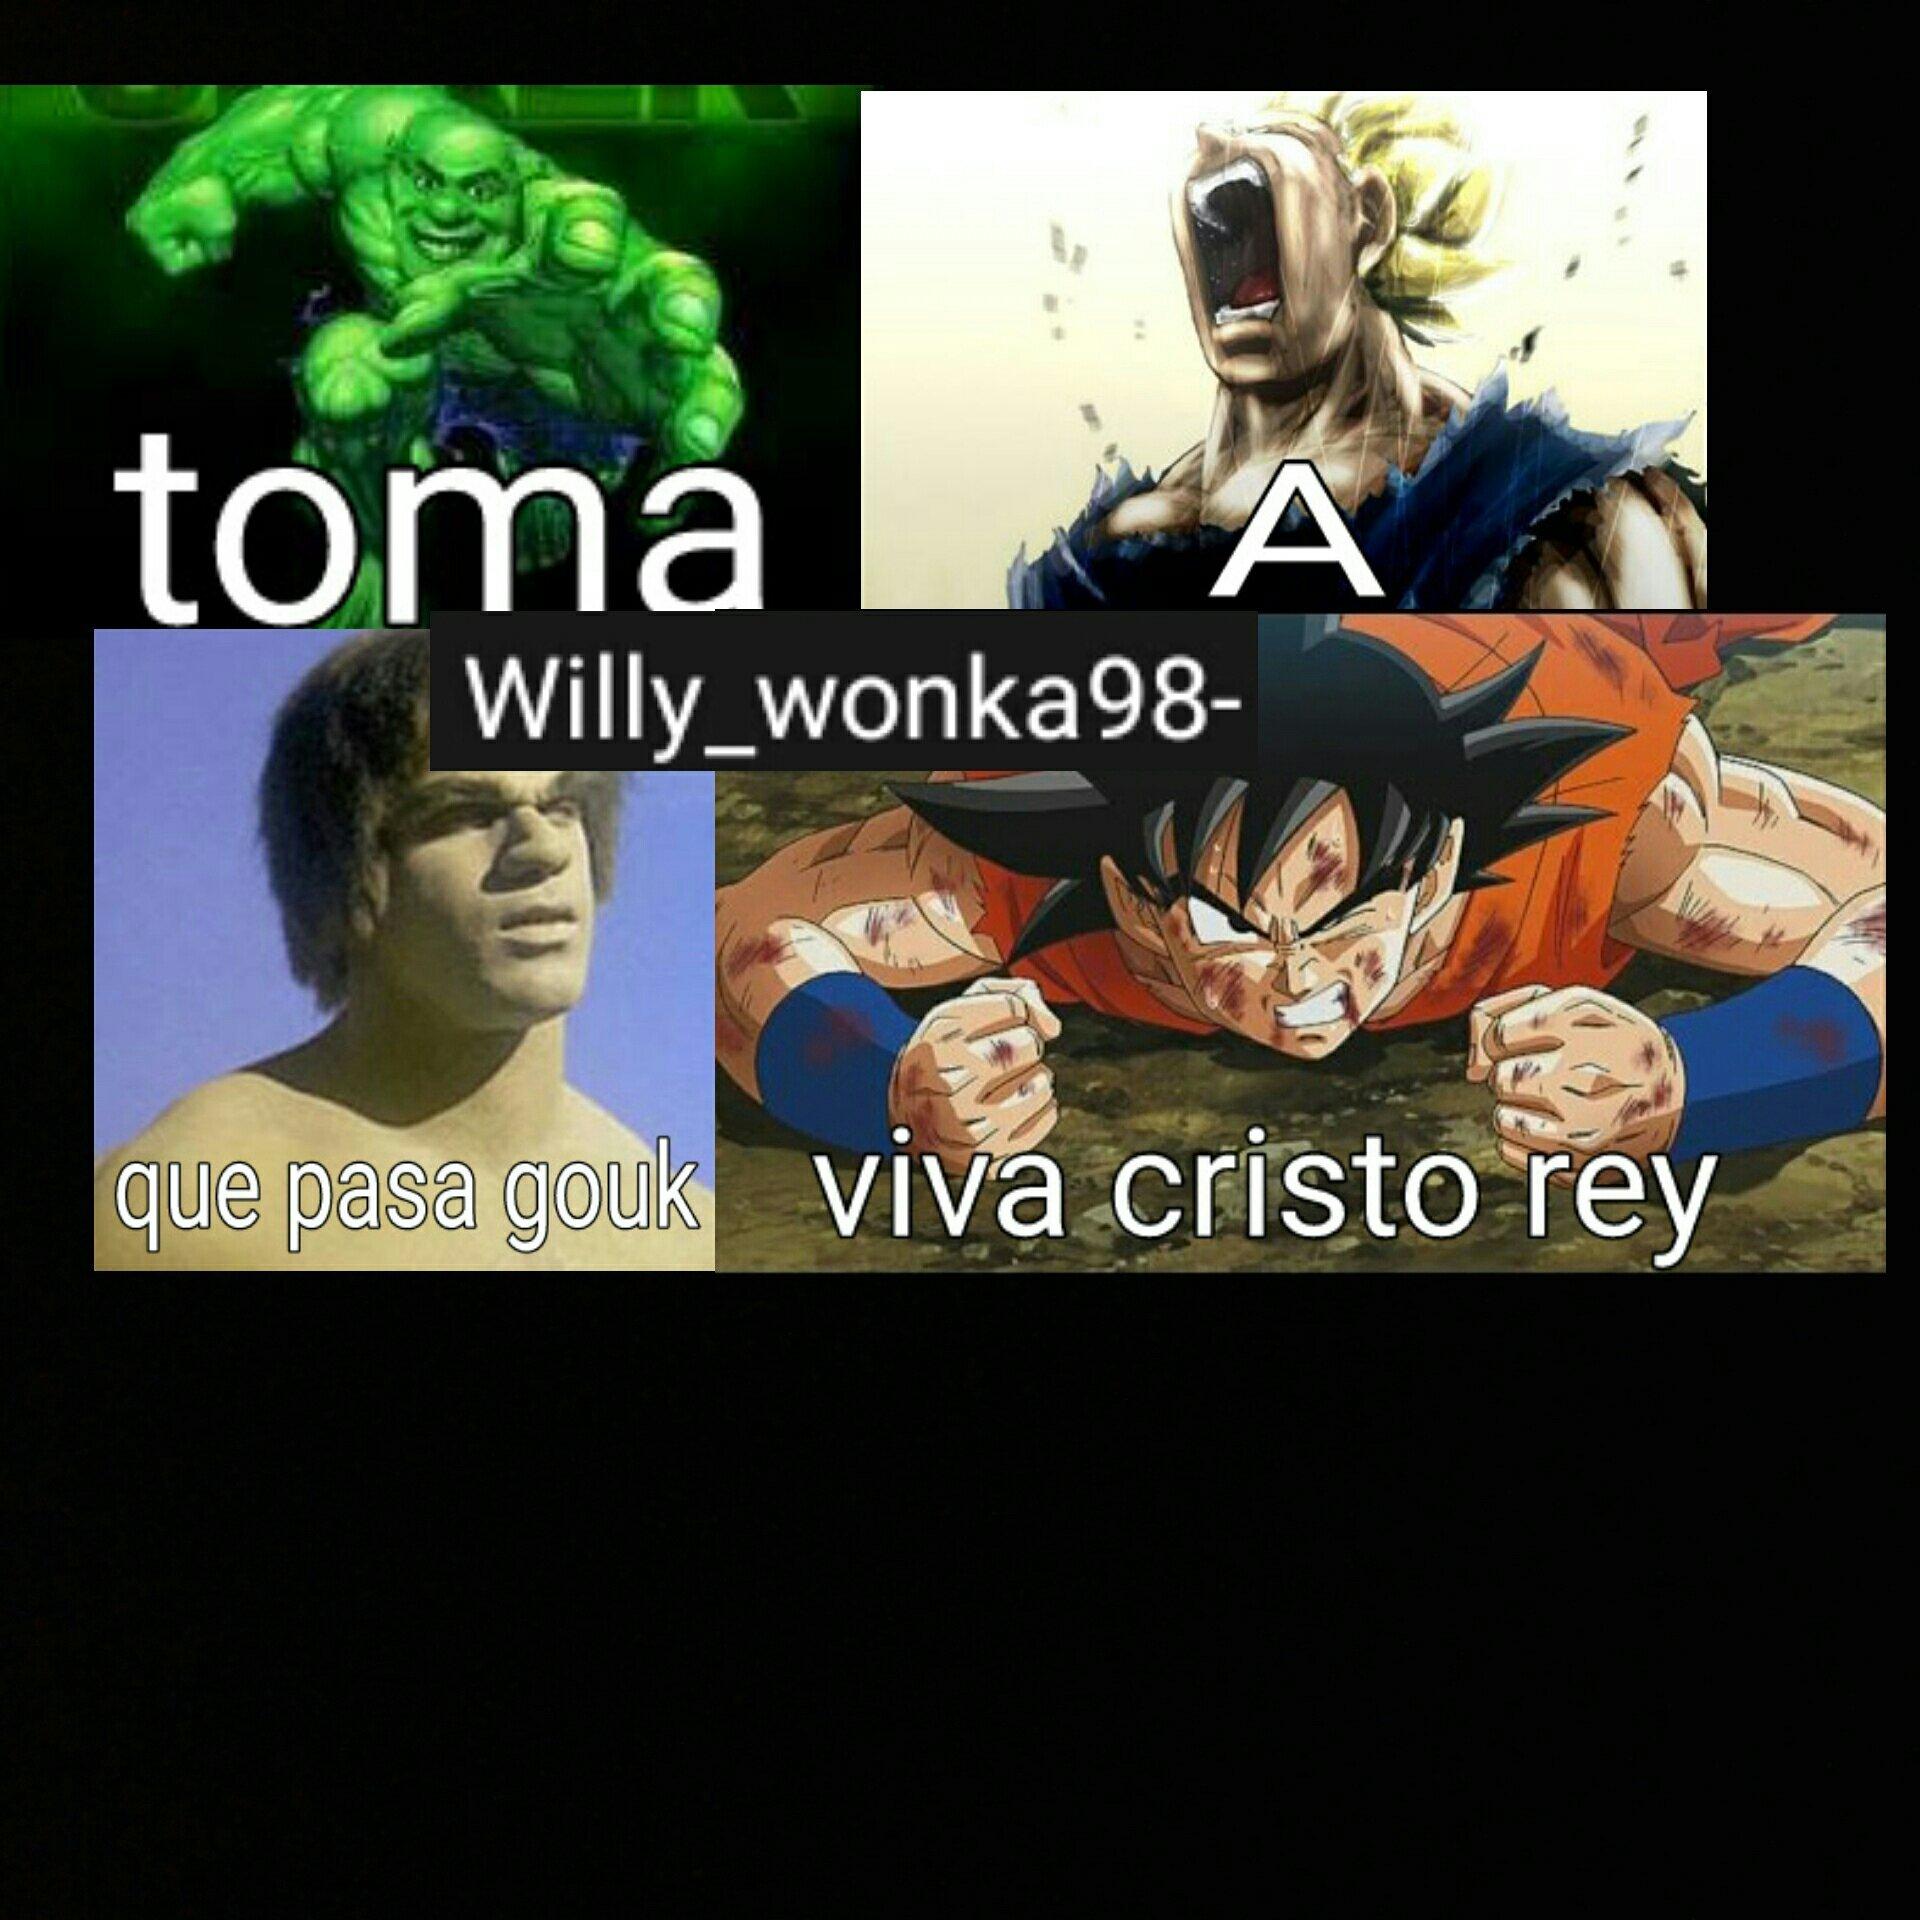 Humor hoy en dia be like: - meme